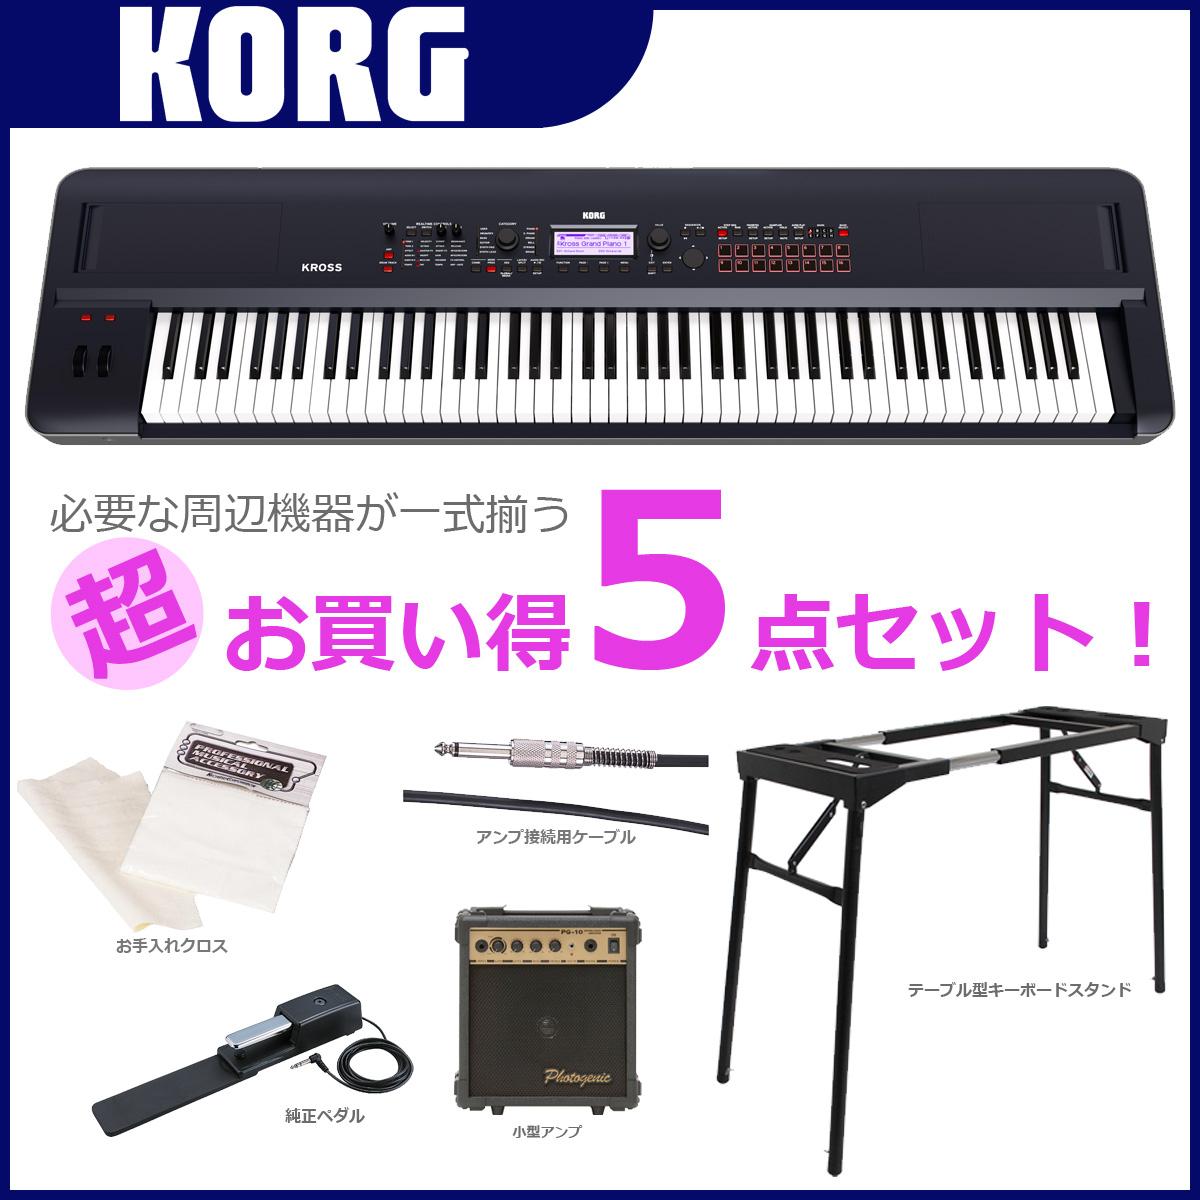 KORG コルグ / KROSS2-88 DB ダークブルー【豪華5点セット!】【YRK】